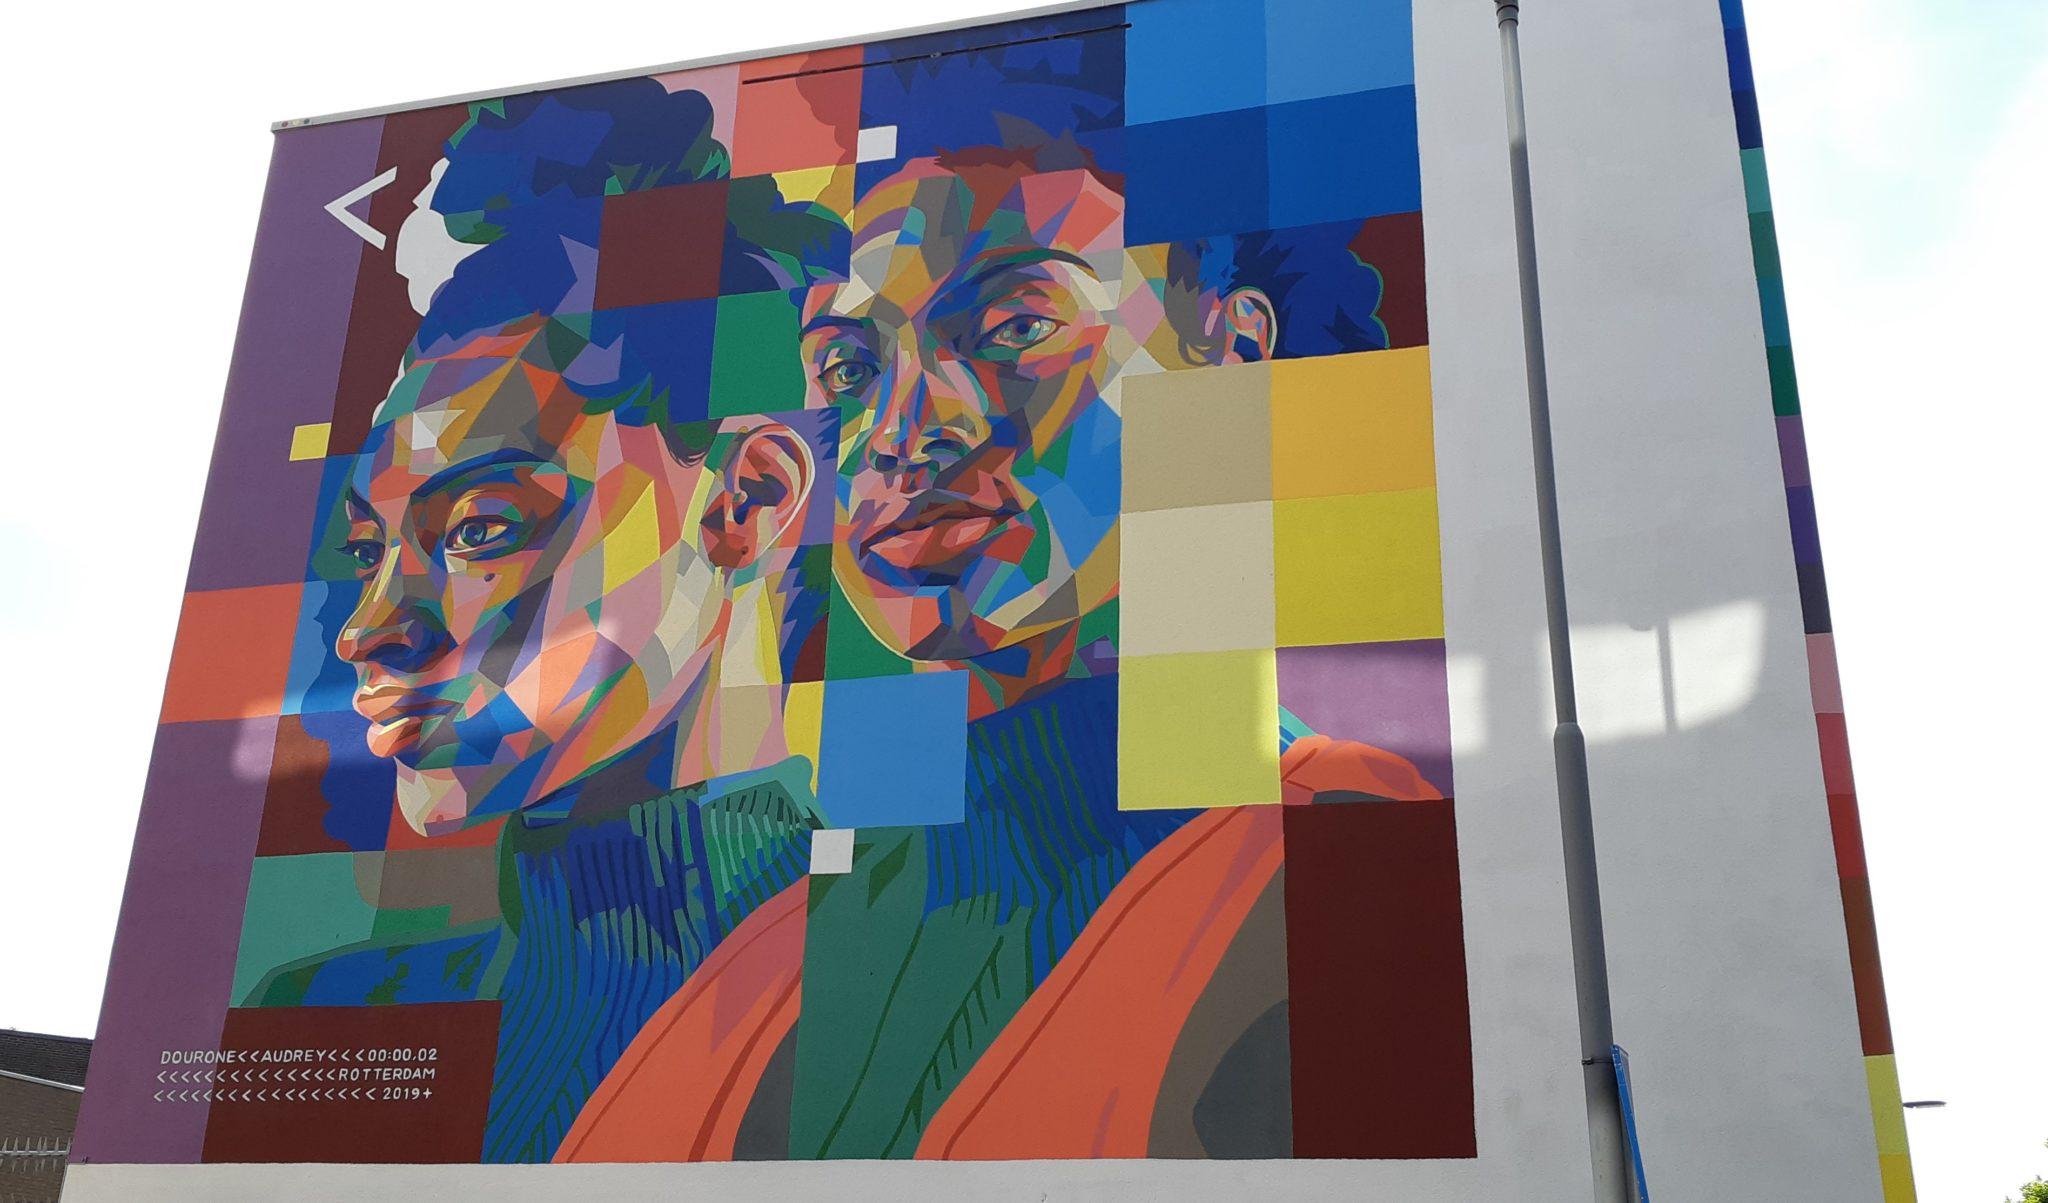 Dourone pow wow street art rotterdam